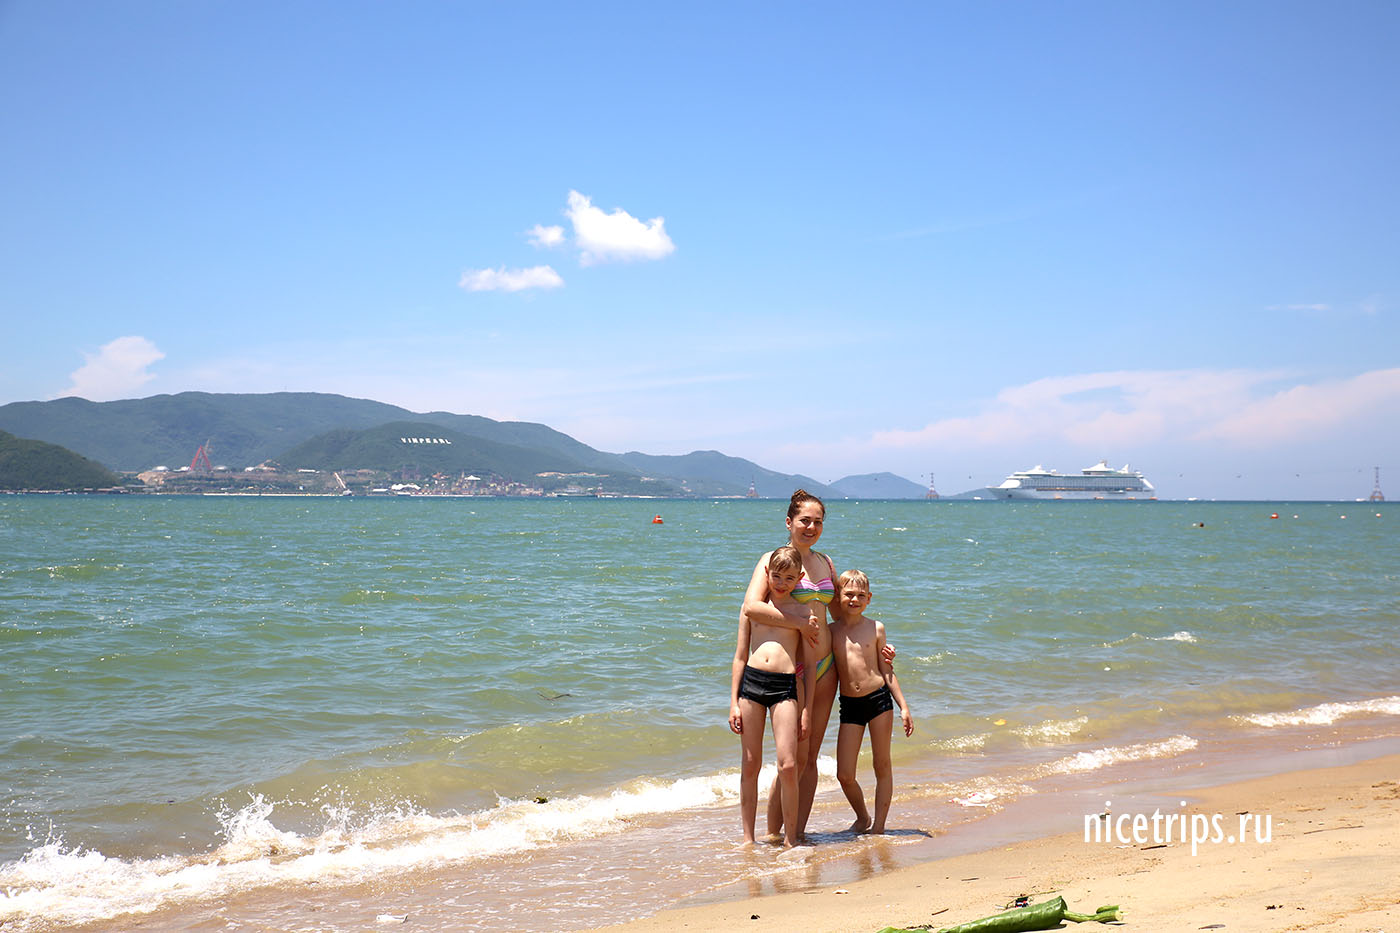 Вьетнамский пляж